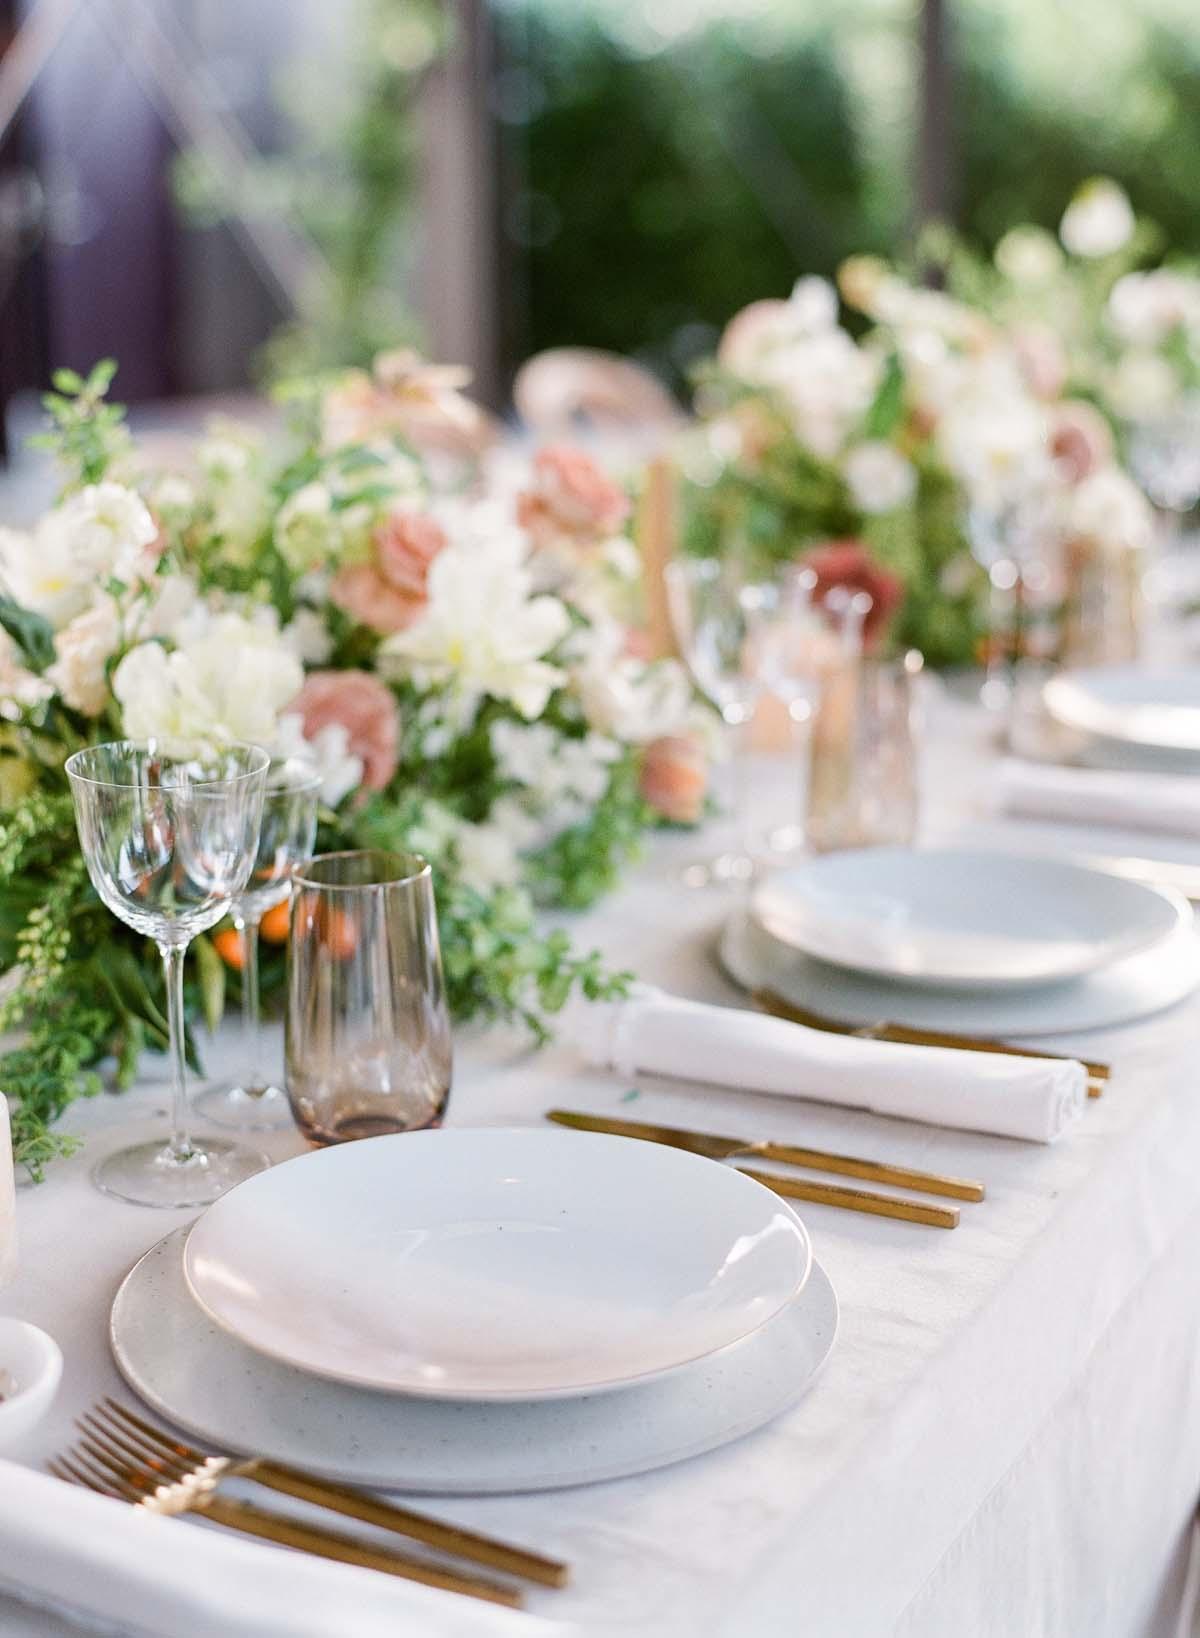 XOXO_BRIDE_Events-Michelle-Beller_Photography_0113